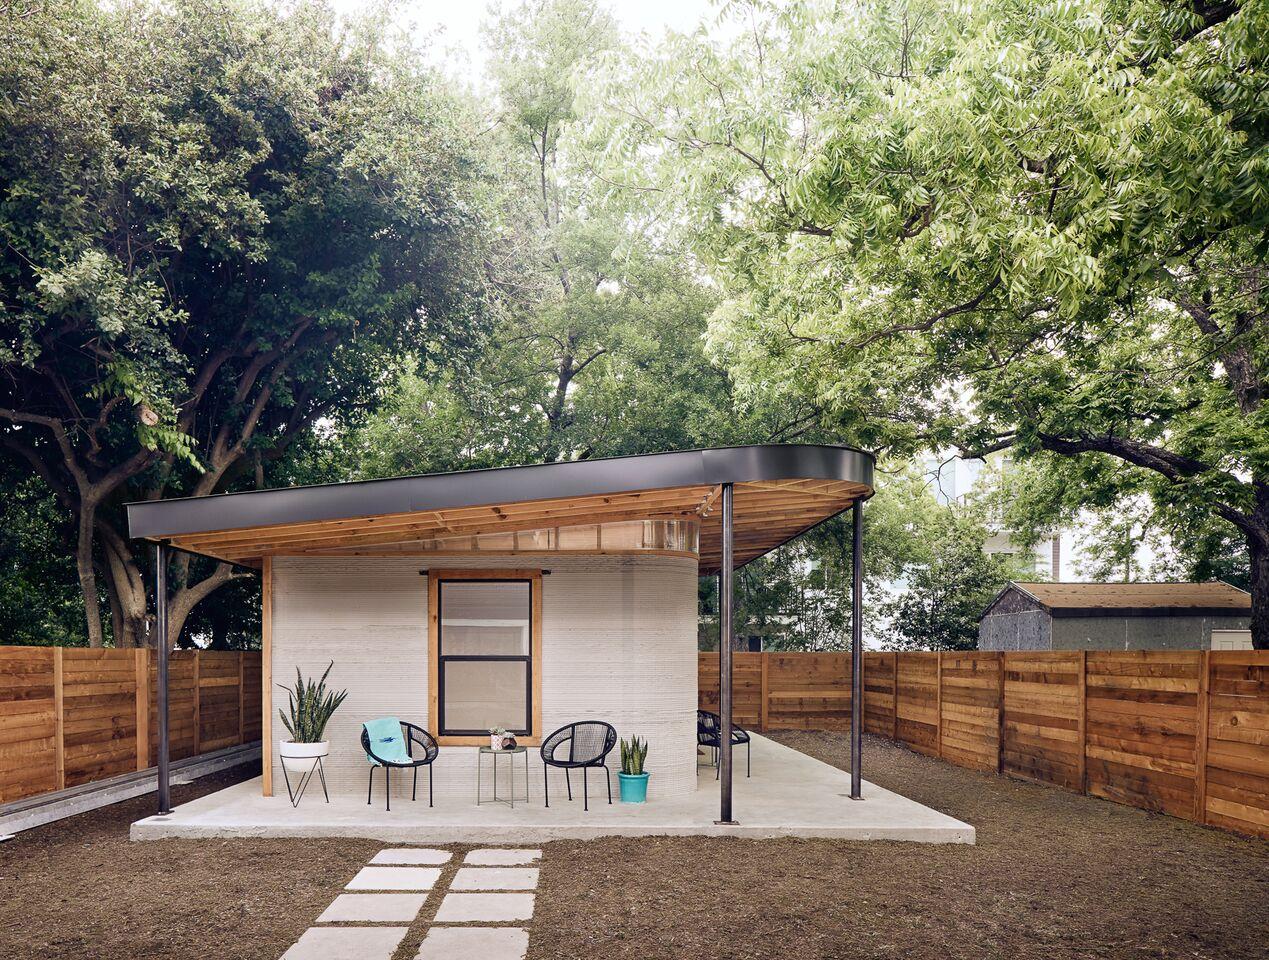 ICON's first 3D printed home in Austin, Texas. Photo via ICON.